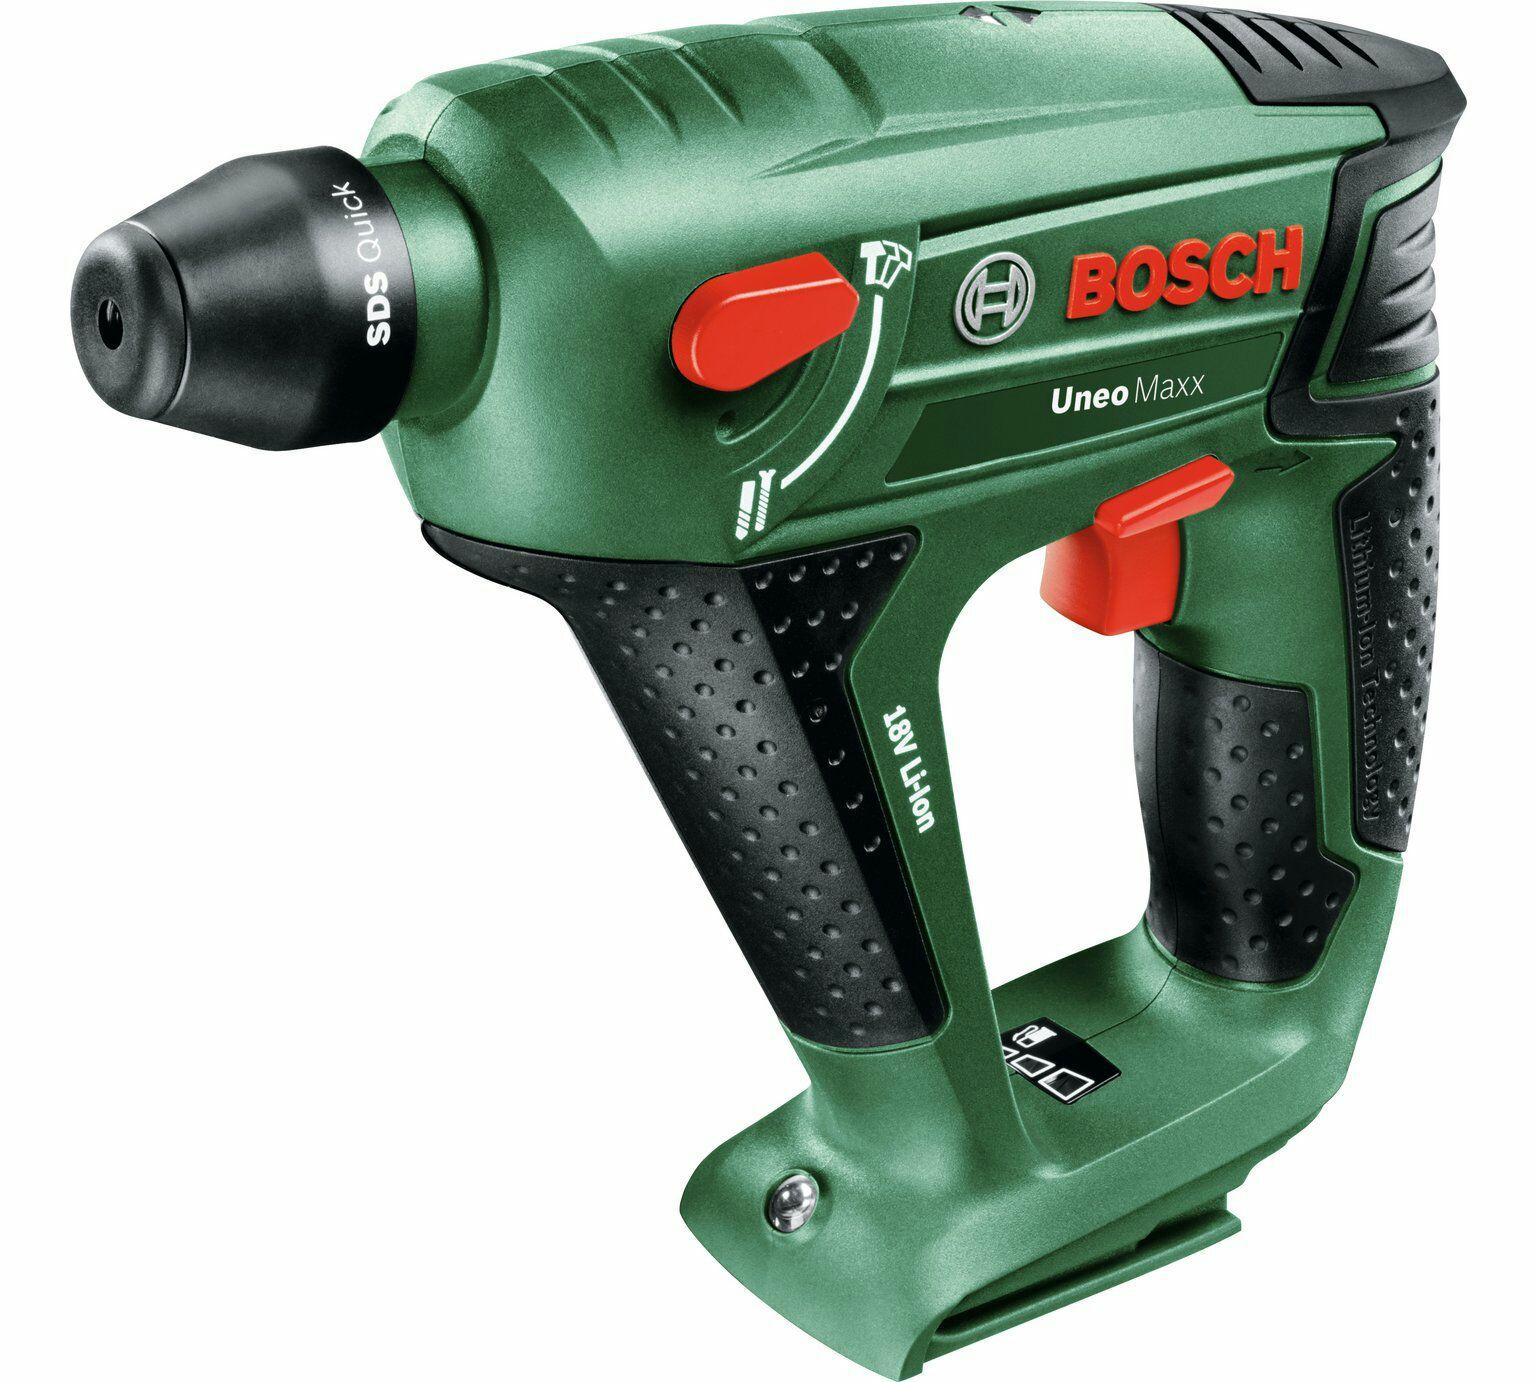 Bosch Uneo Maxx Cordless Bare Hammer Drill - No Battery - £43.22 @ Argos